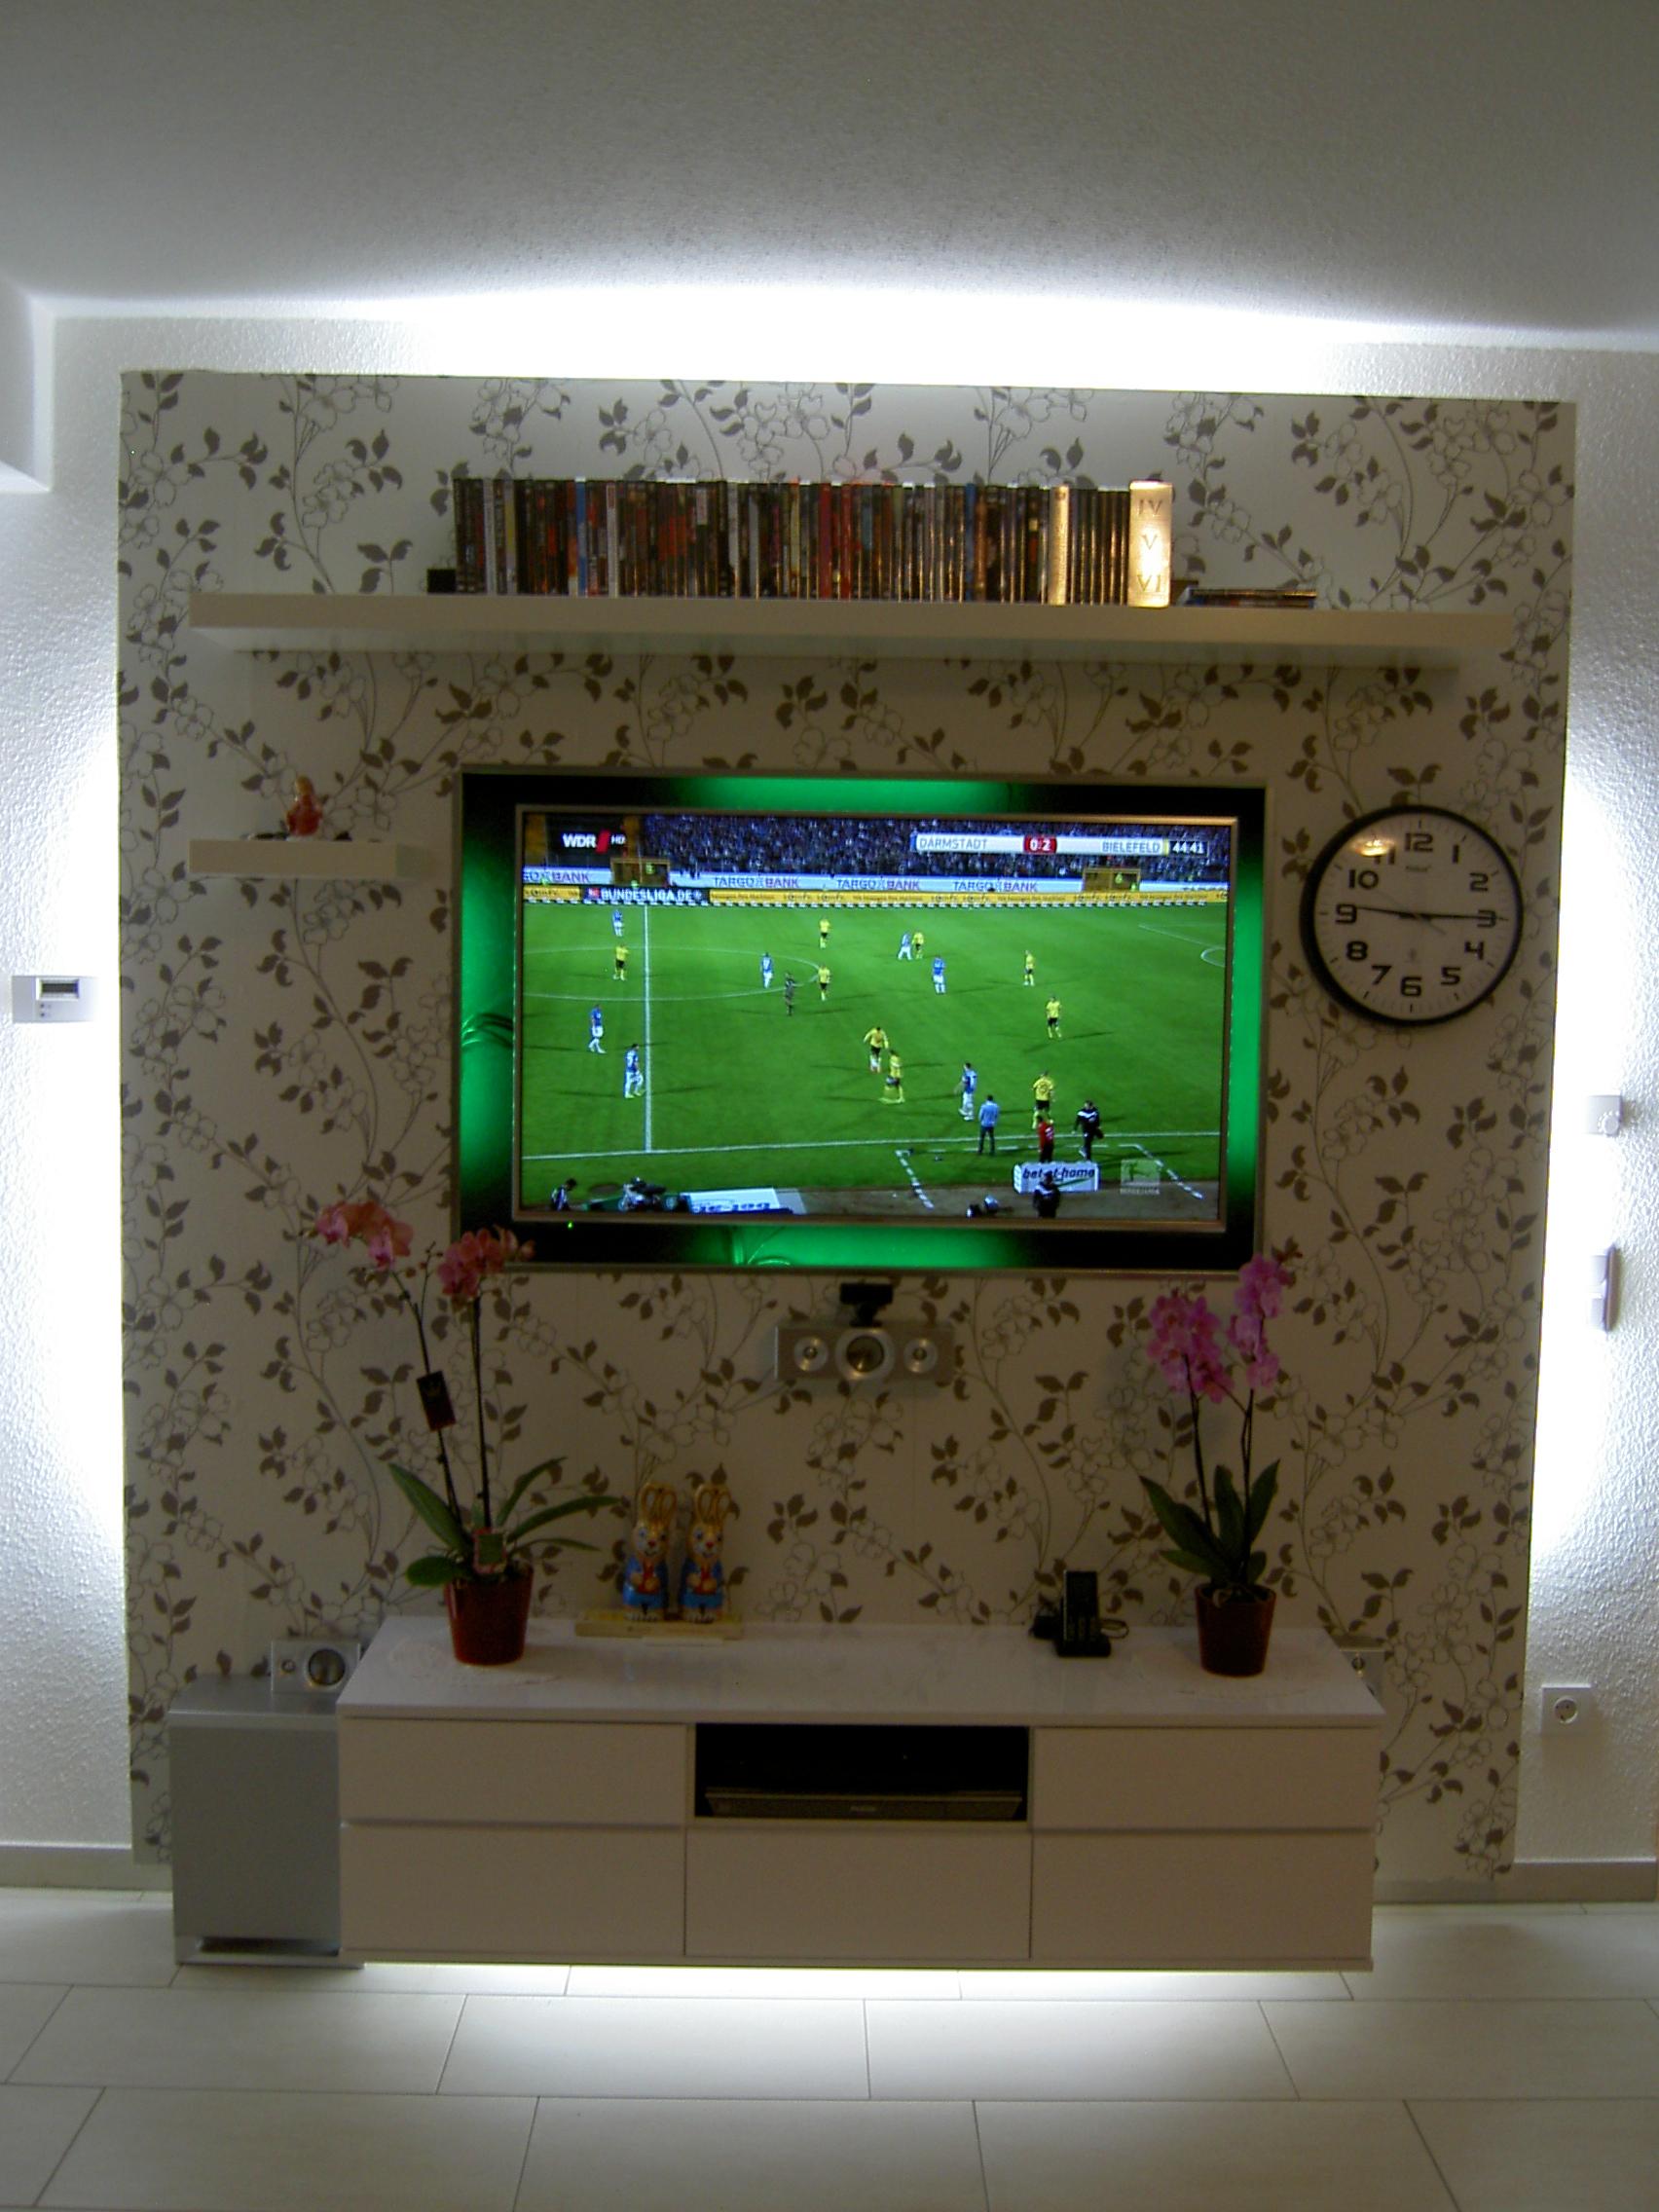 kallax tv wand in der Wand verbaut